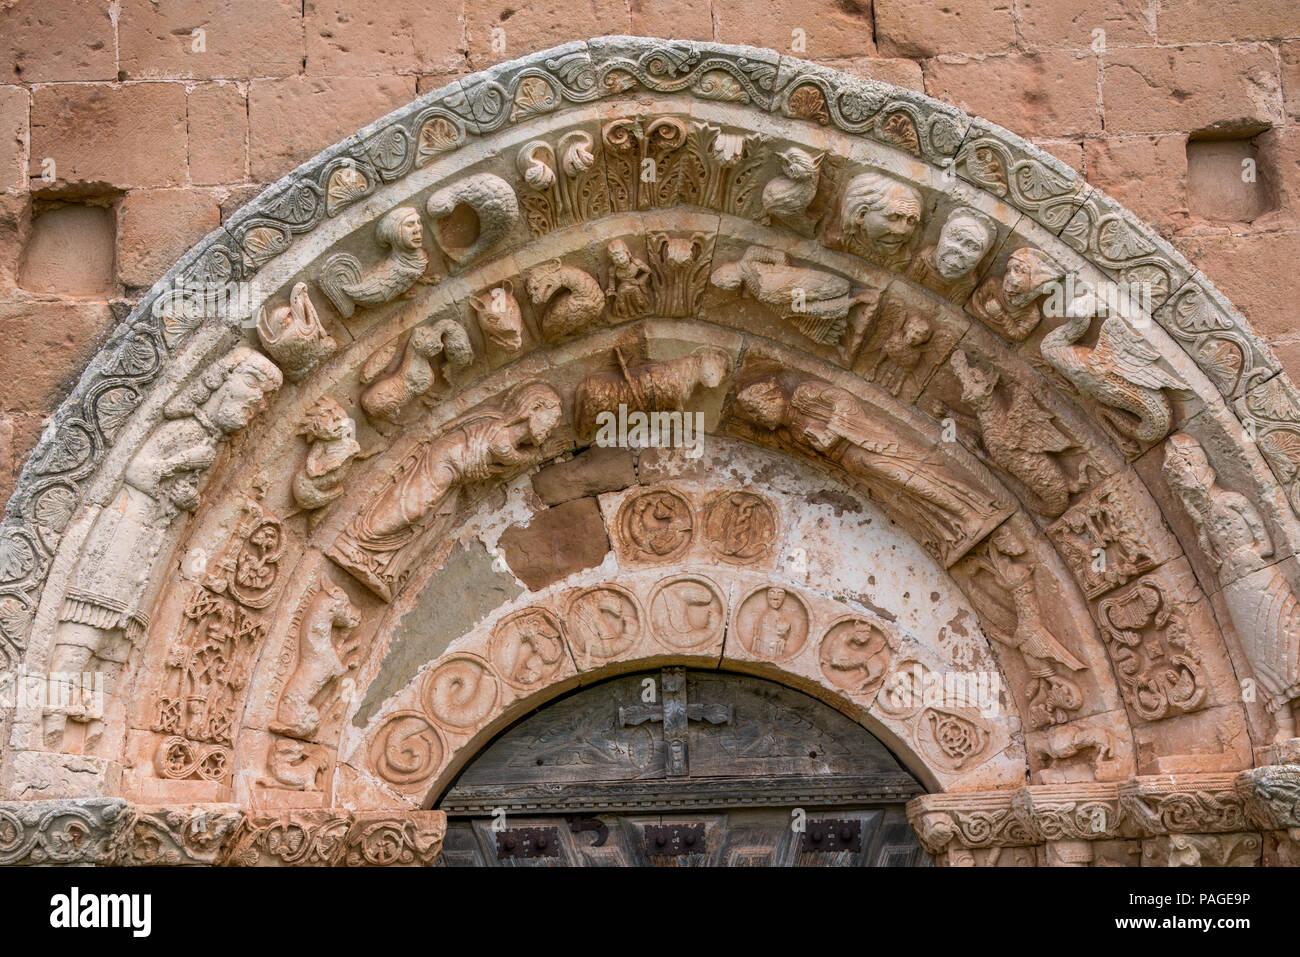 Vitesse datant Burgos datation biostratigraphique